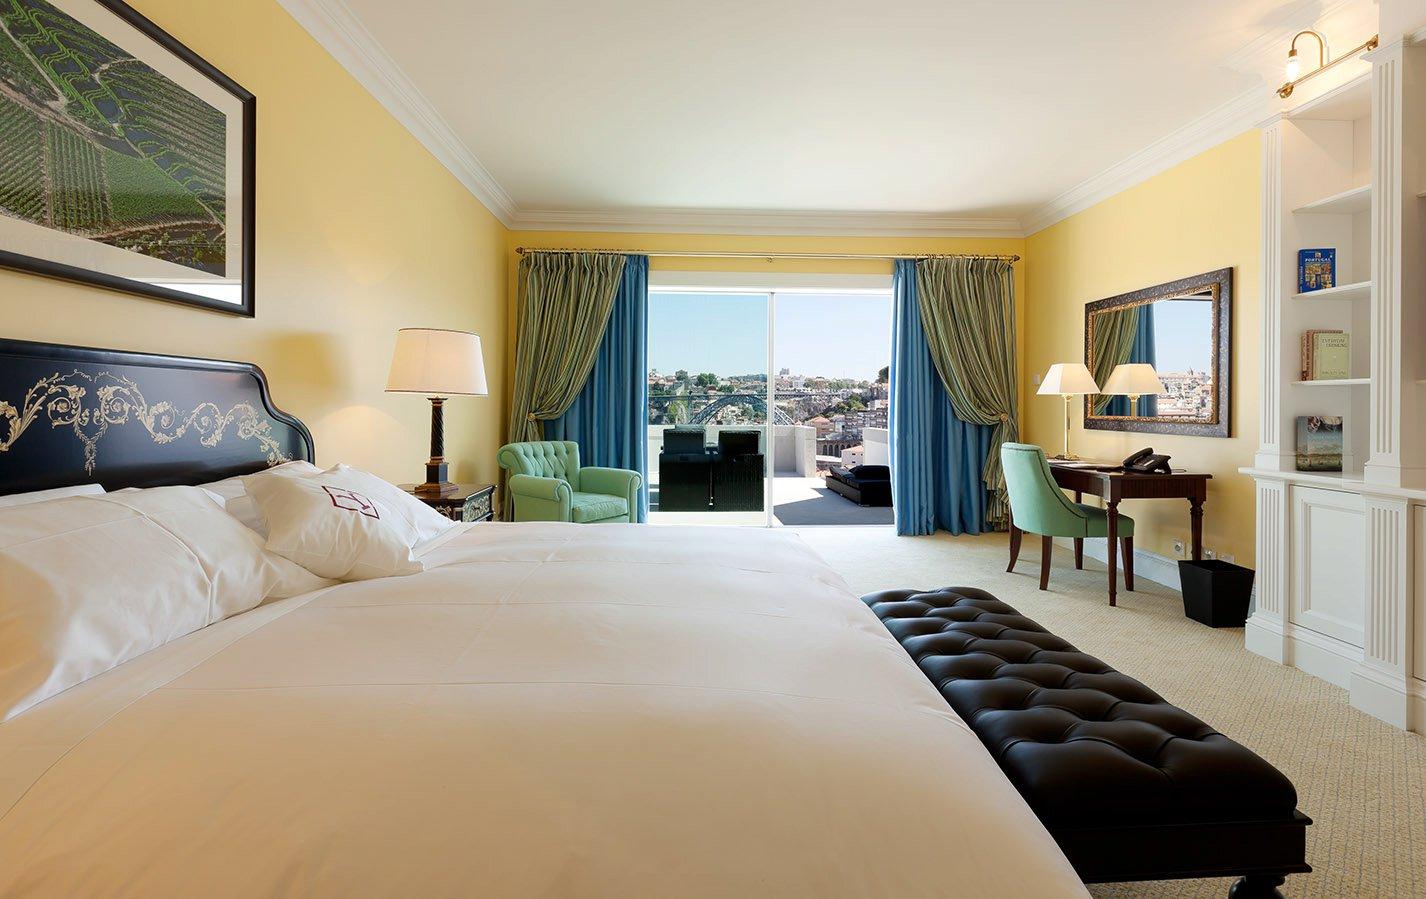 Chambre Superieure The Yeatman Hotel 5 Etoiles Porto Week